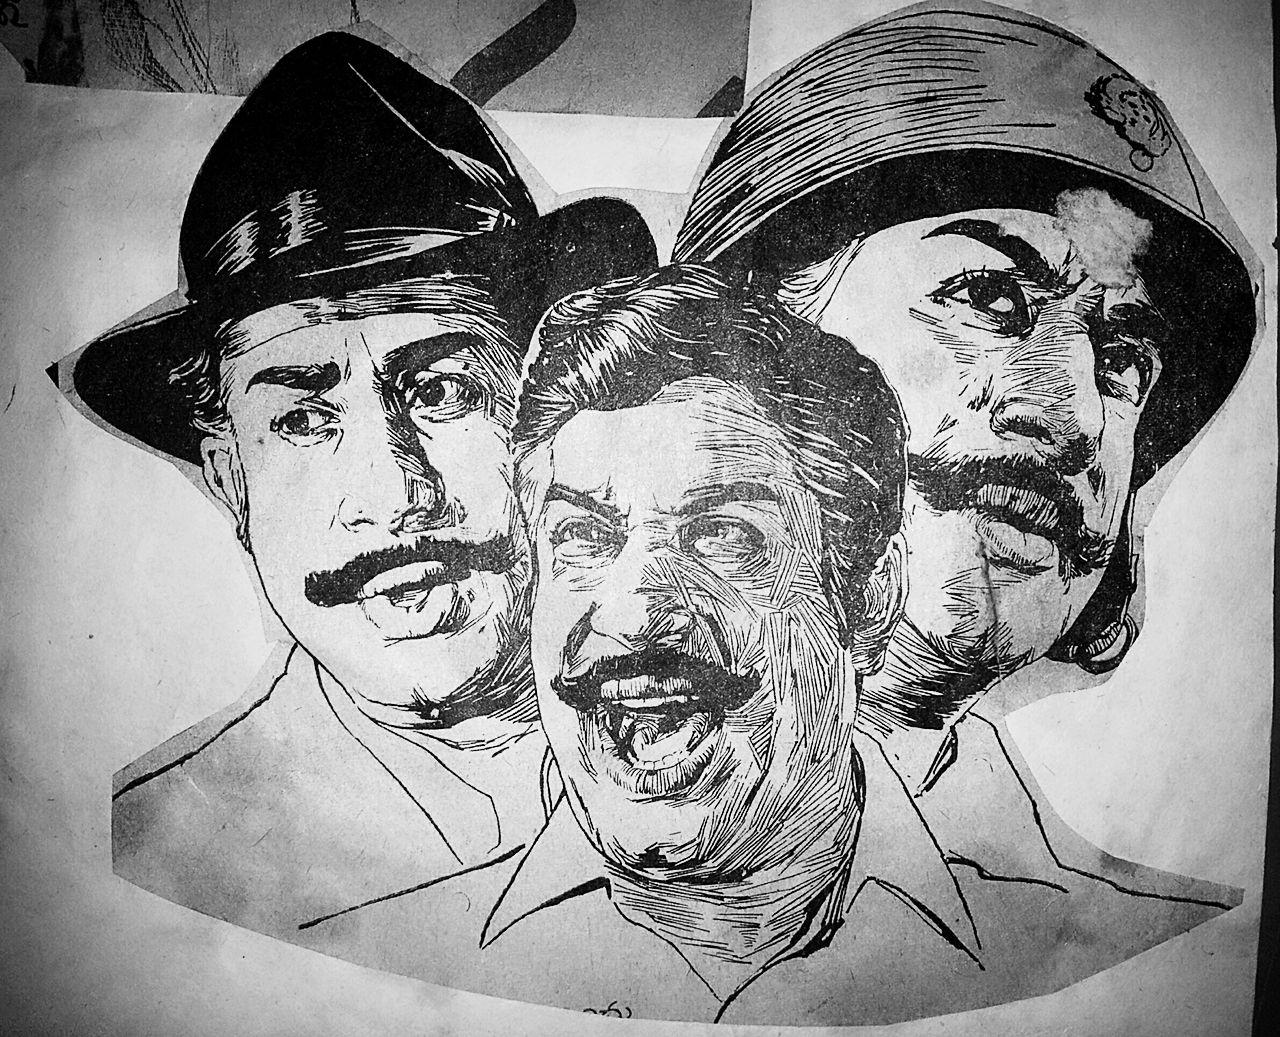 Tamil Hero Shivaji Ganeshan - 1970s drawing